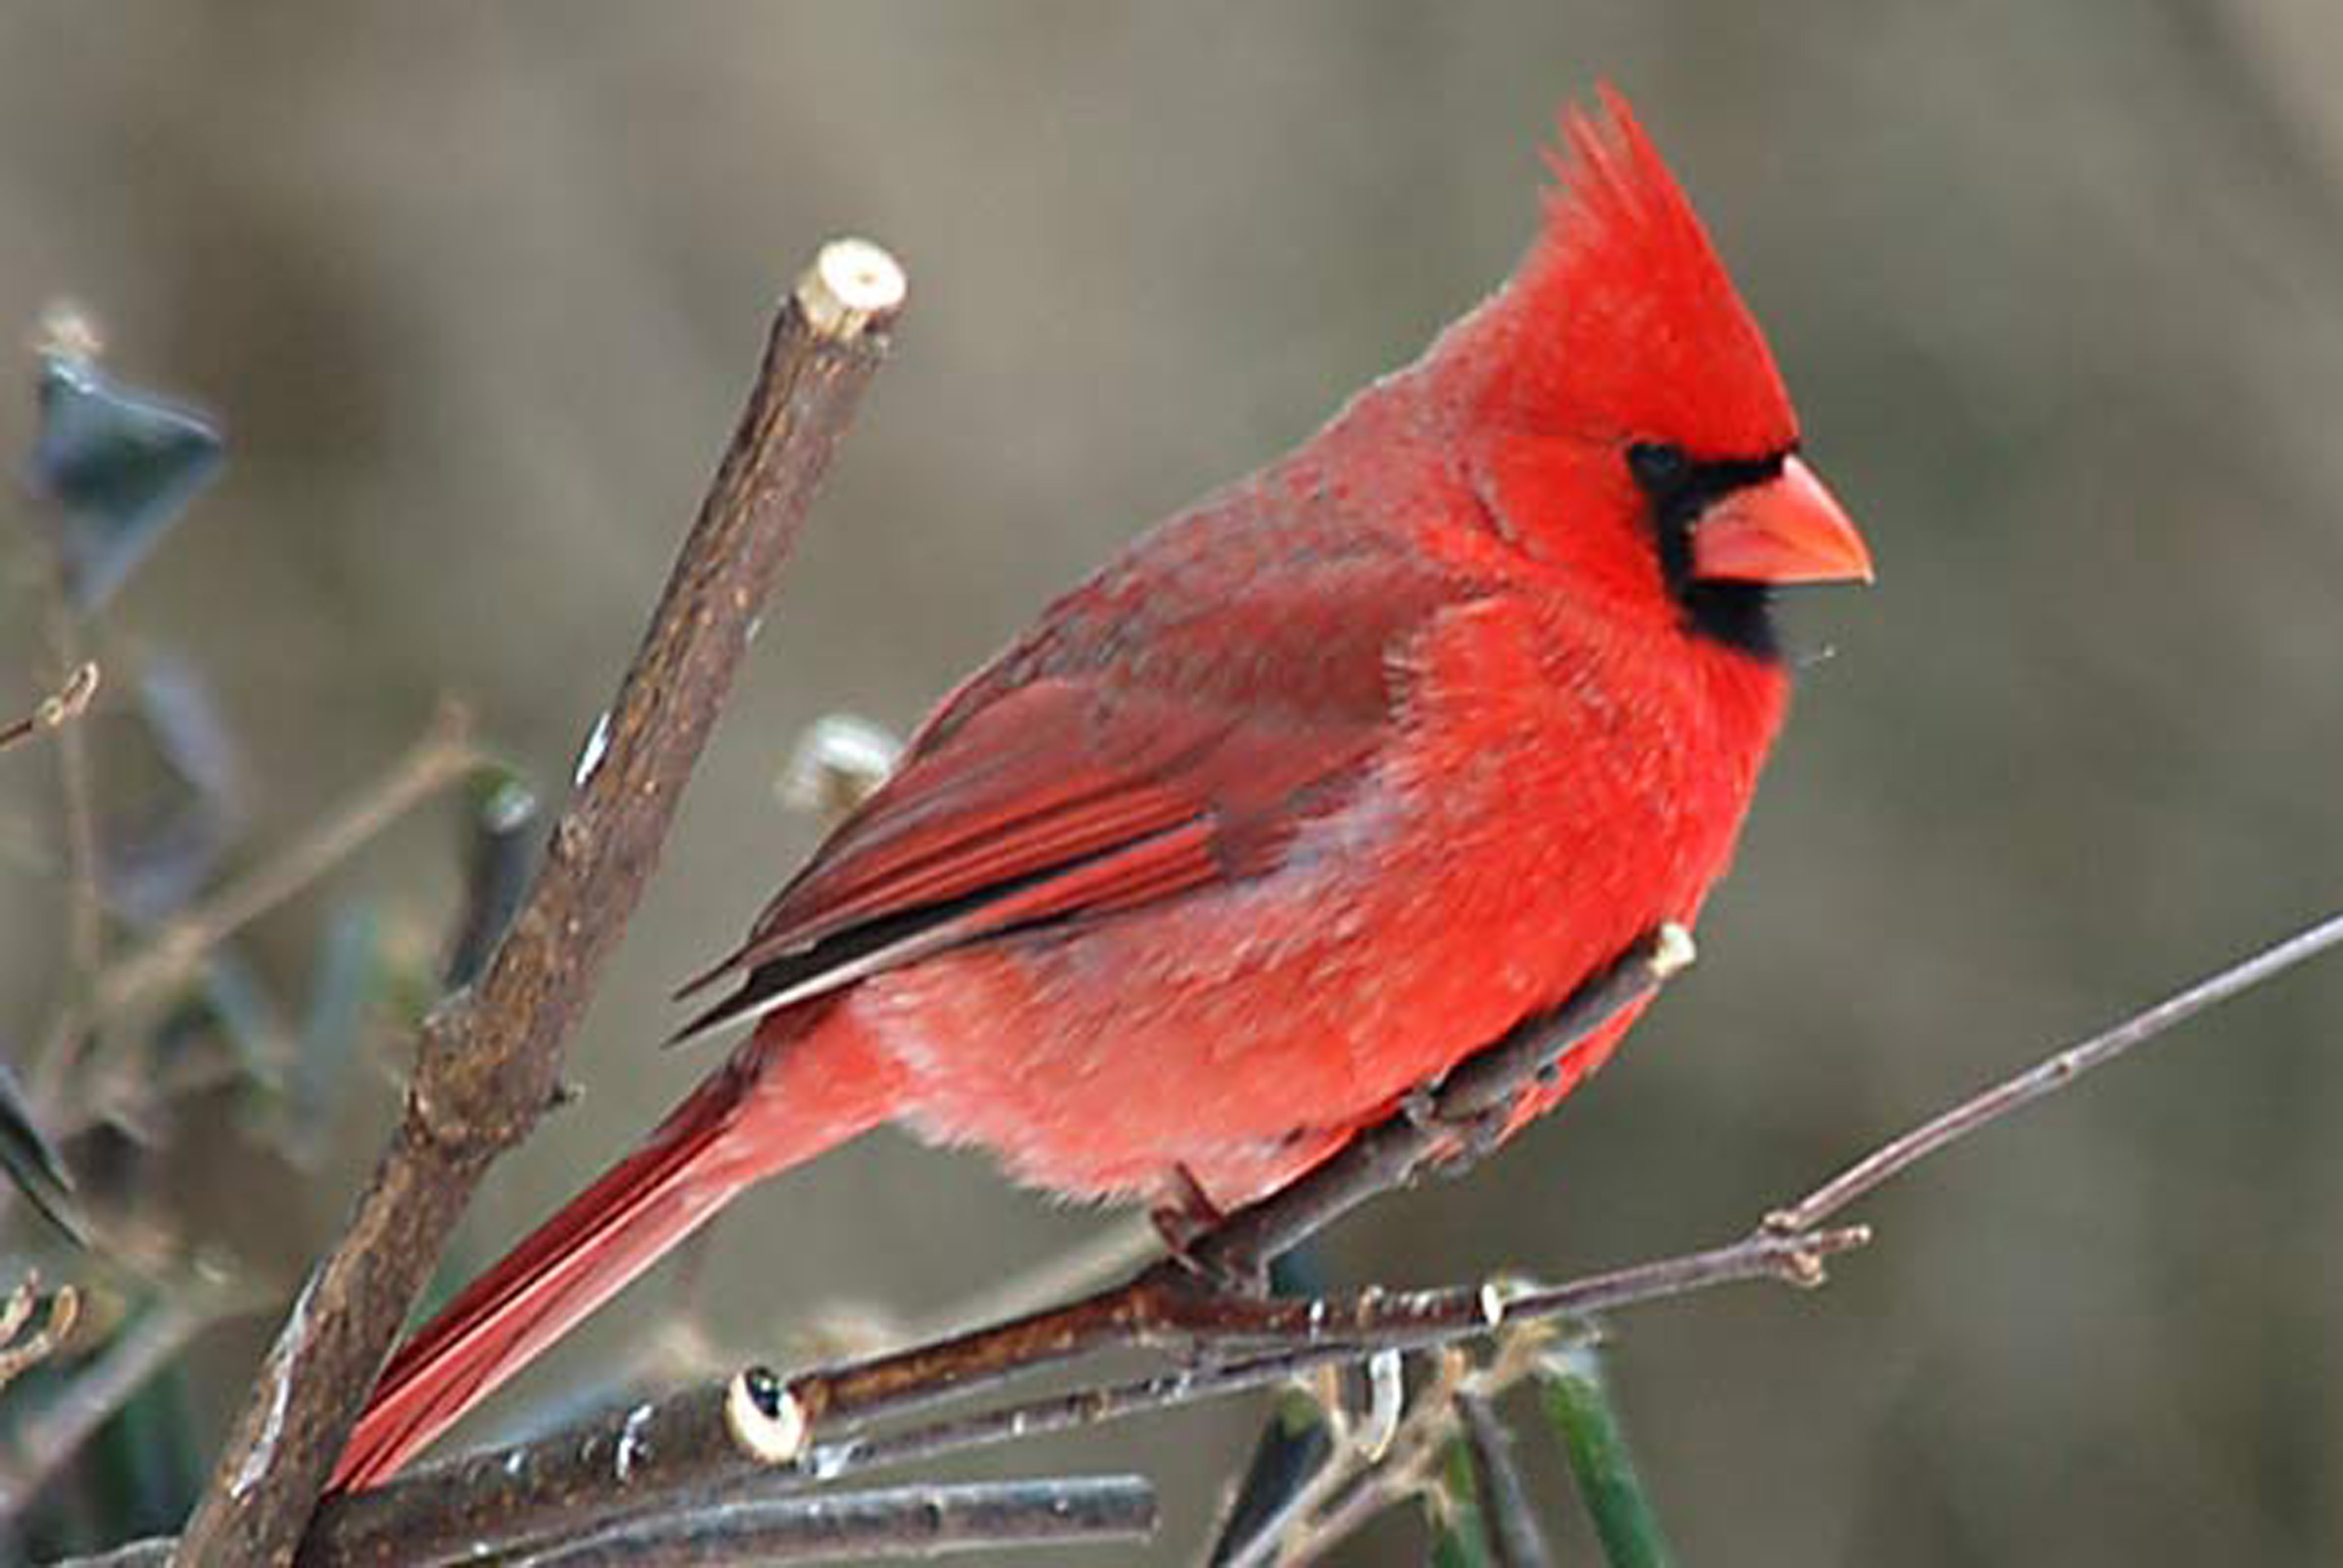 Birds Wallpaper Download For PC Birds Download Cardinal Bird 3872x2592